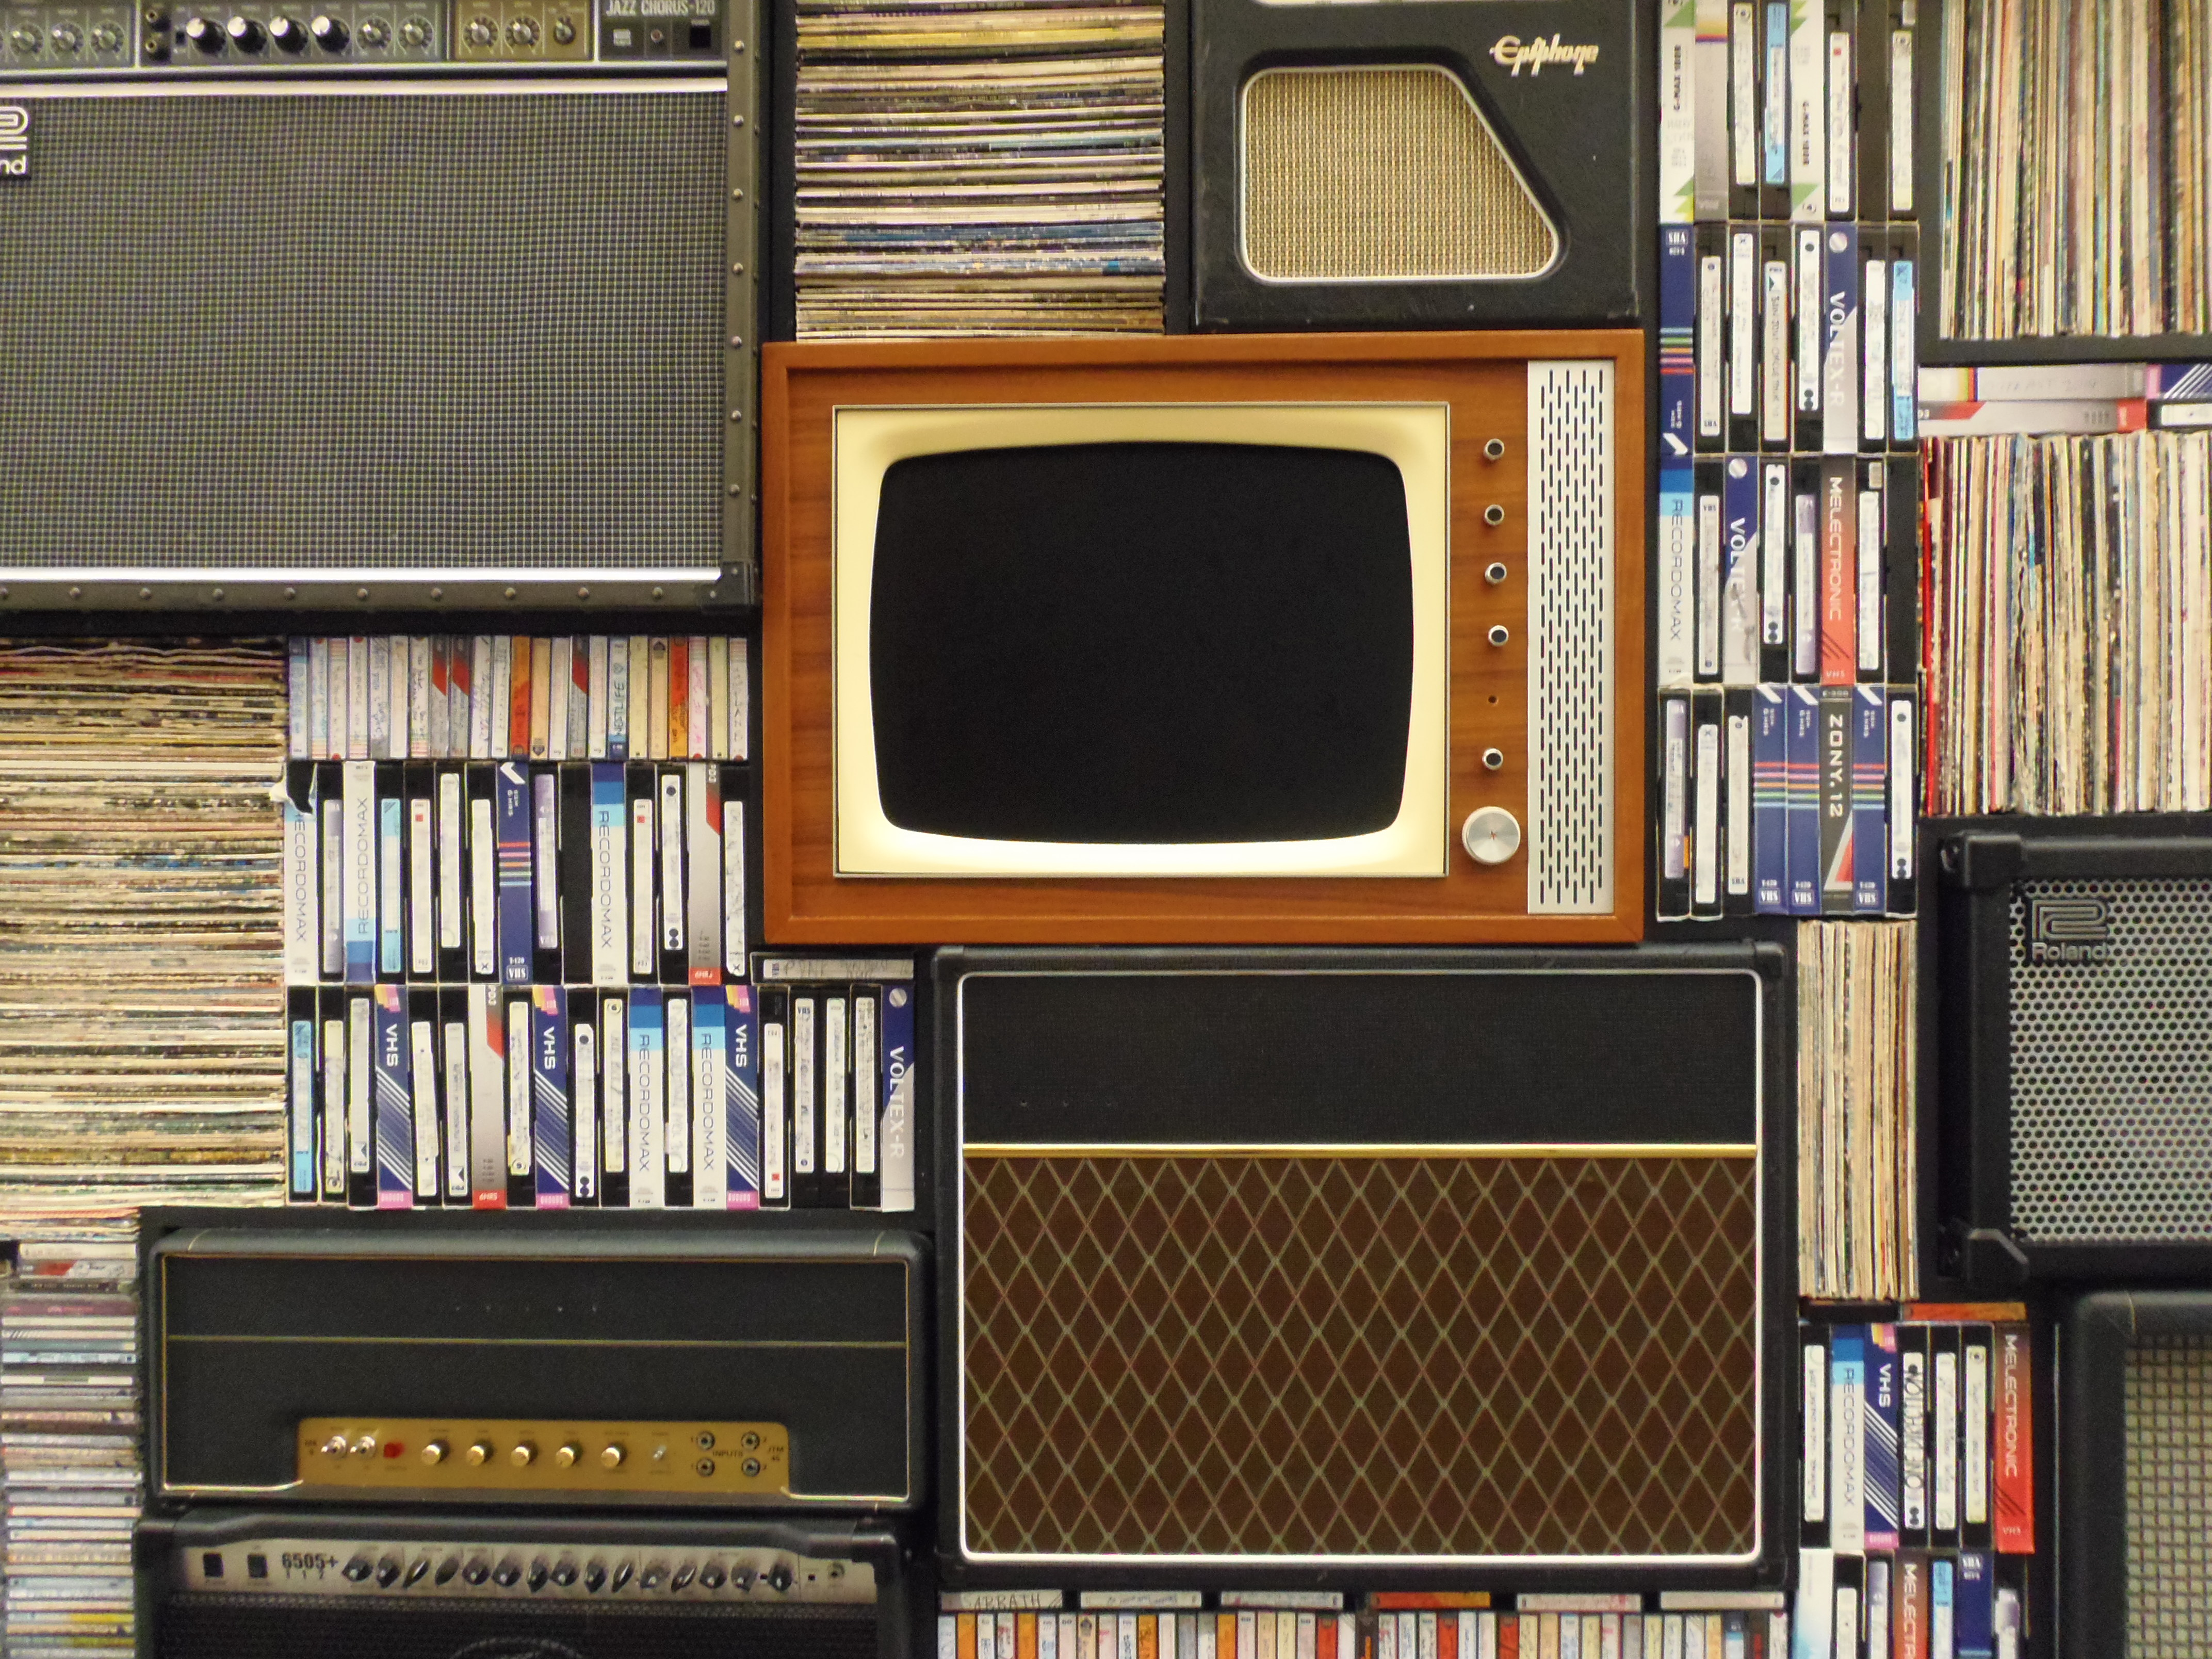 bad-old-tv.jpg